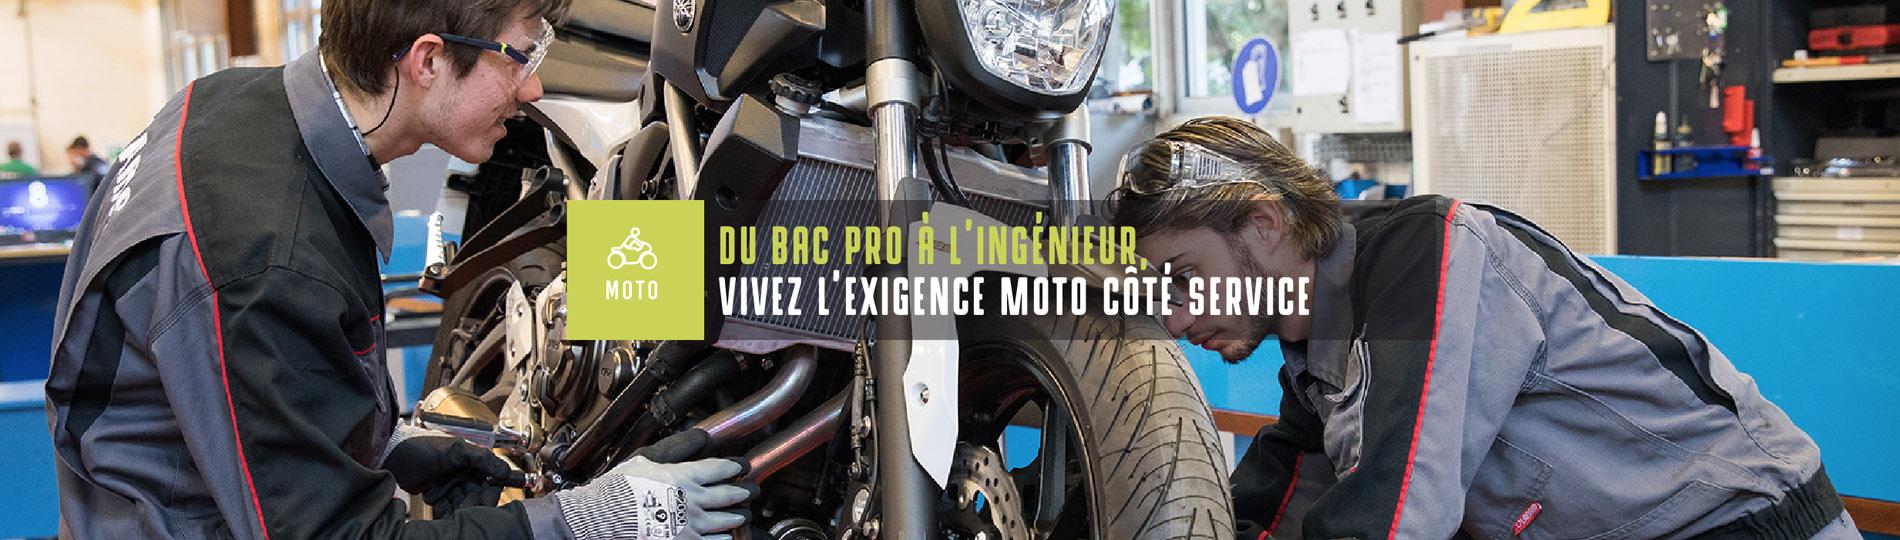 00754f233d8b46 GARAC ecole nationale professions automobile motocycle transport ...